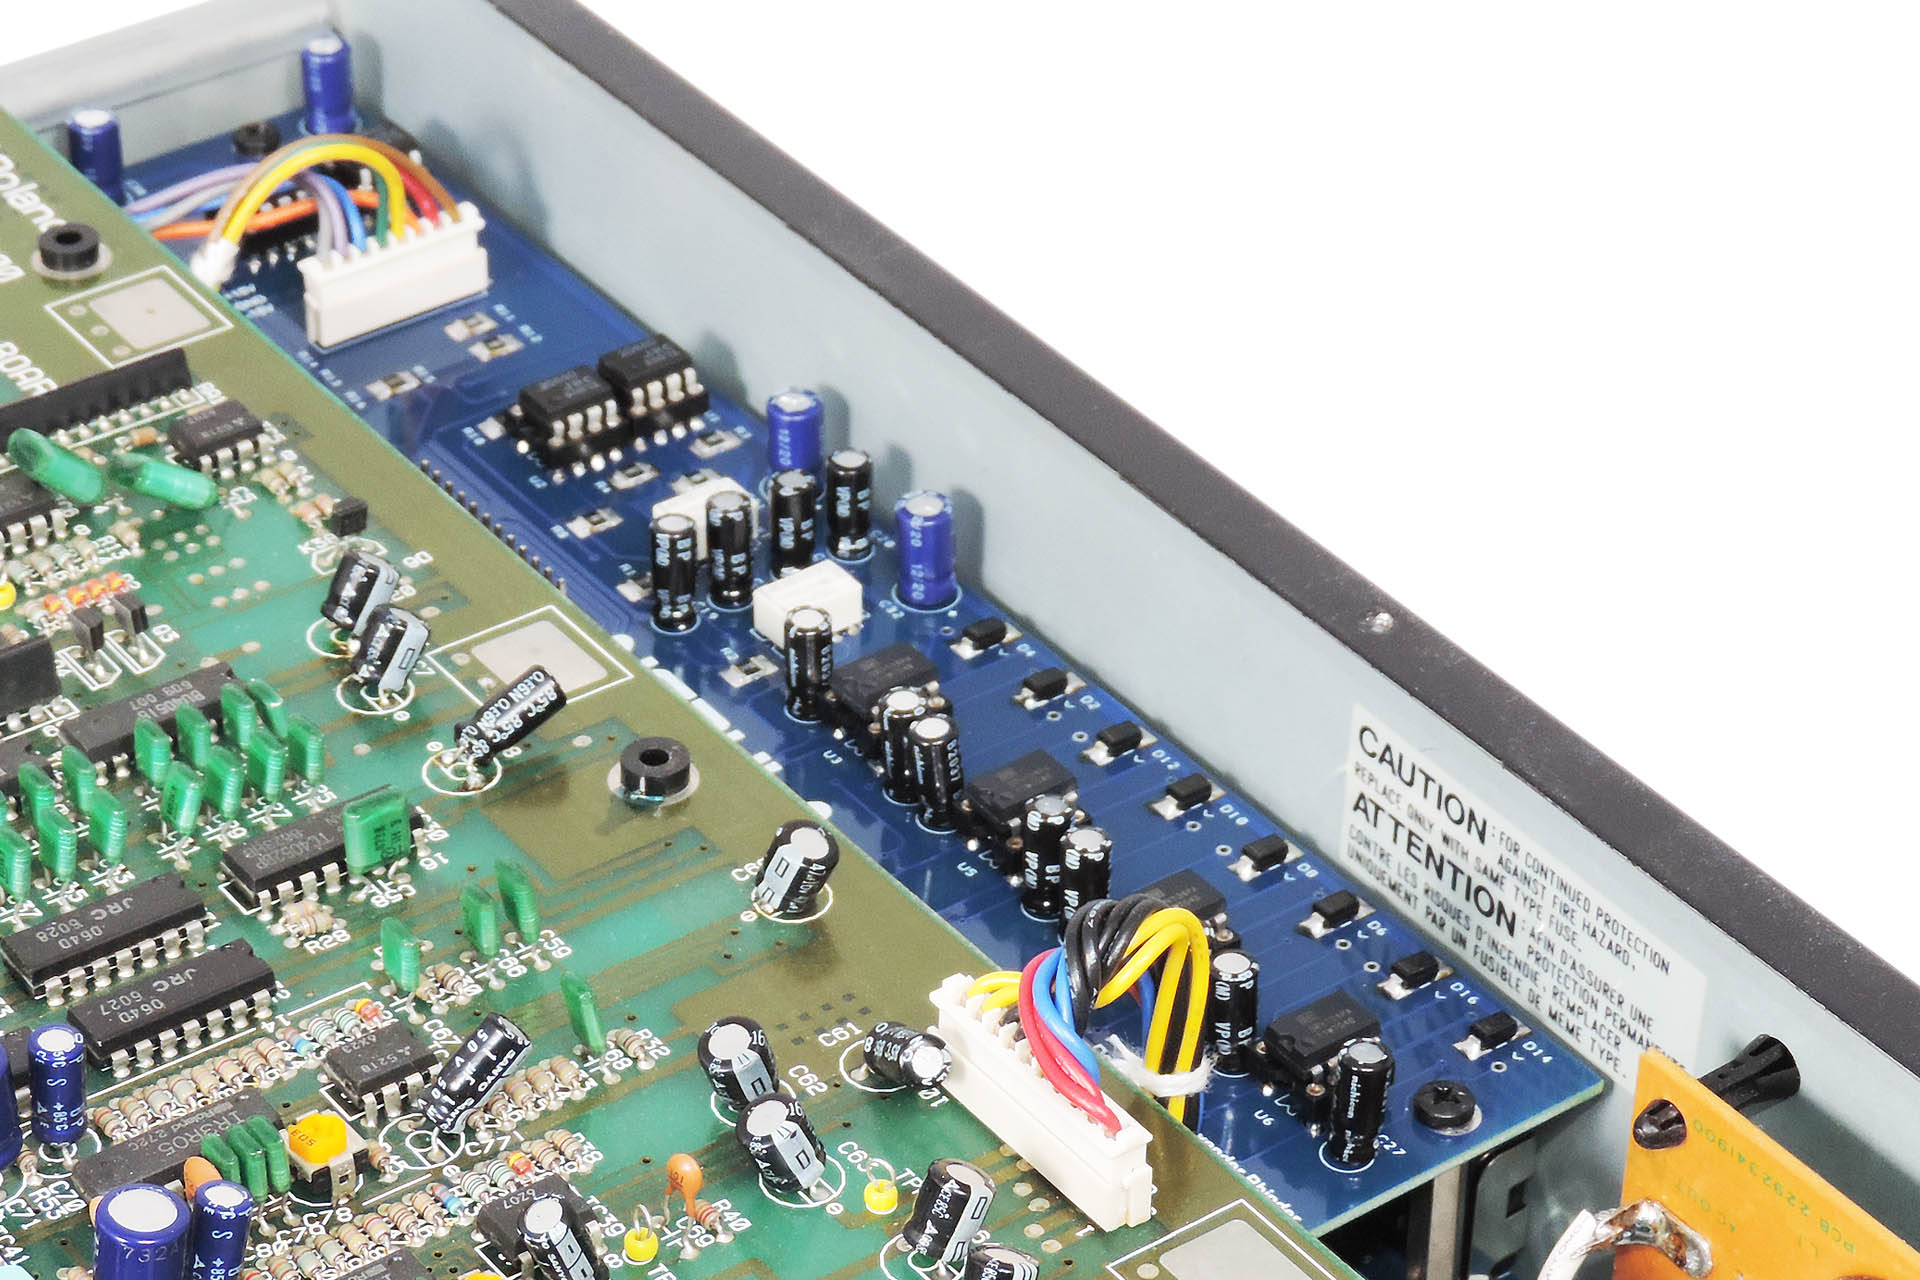 Nebula balanced outputs jack board for the Roland MKS-70